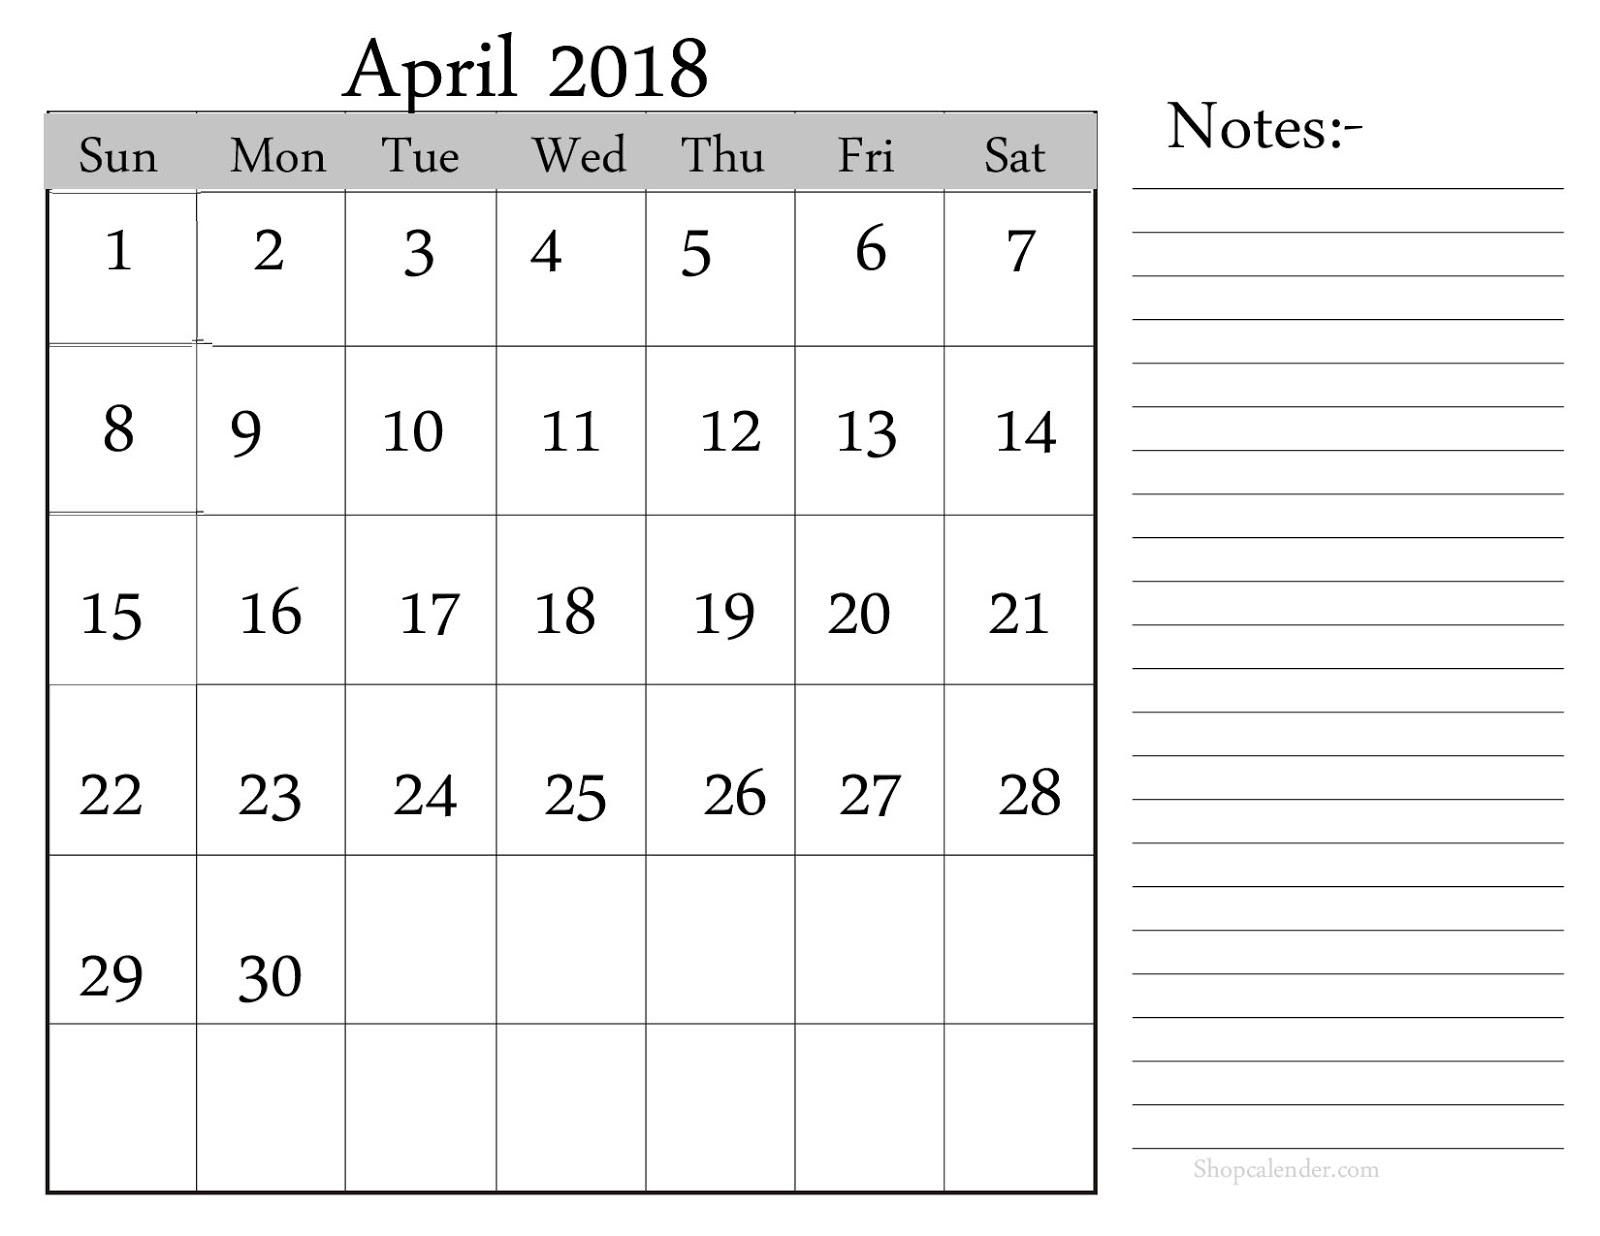 blank calendar for april 2018 2018 april printable calendar april 2018 calendar printable